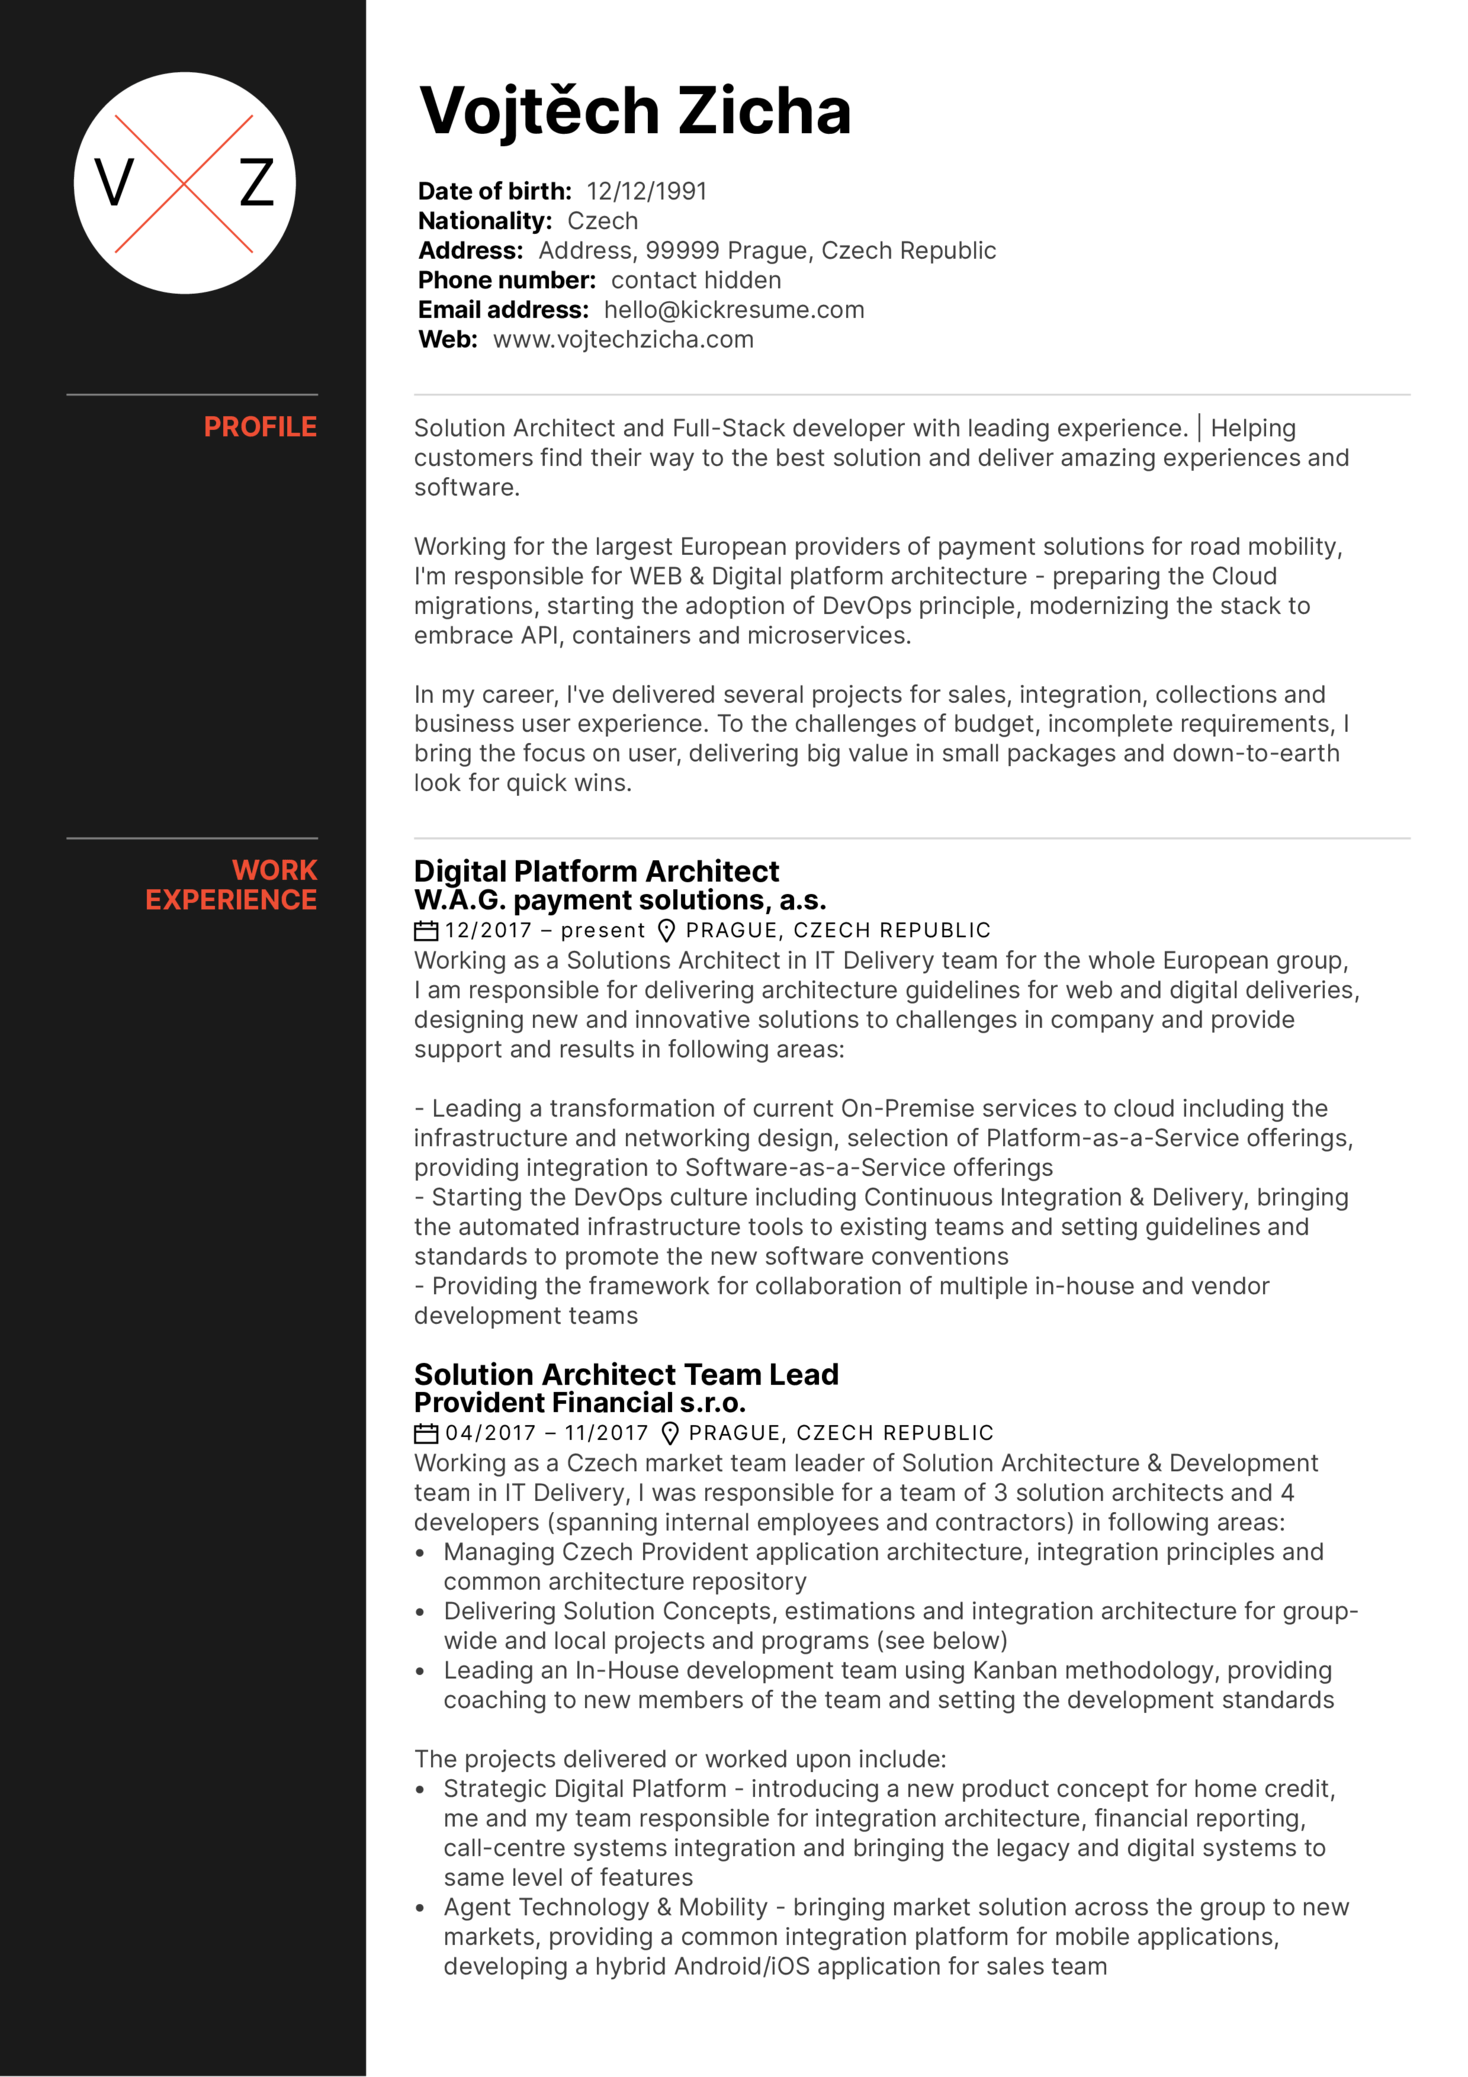 Solution Architect Resume Sample (parte 1)